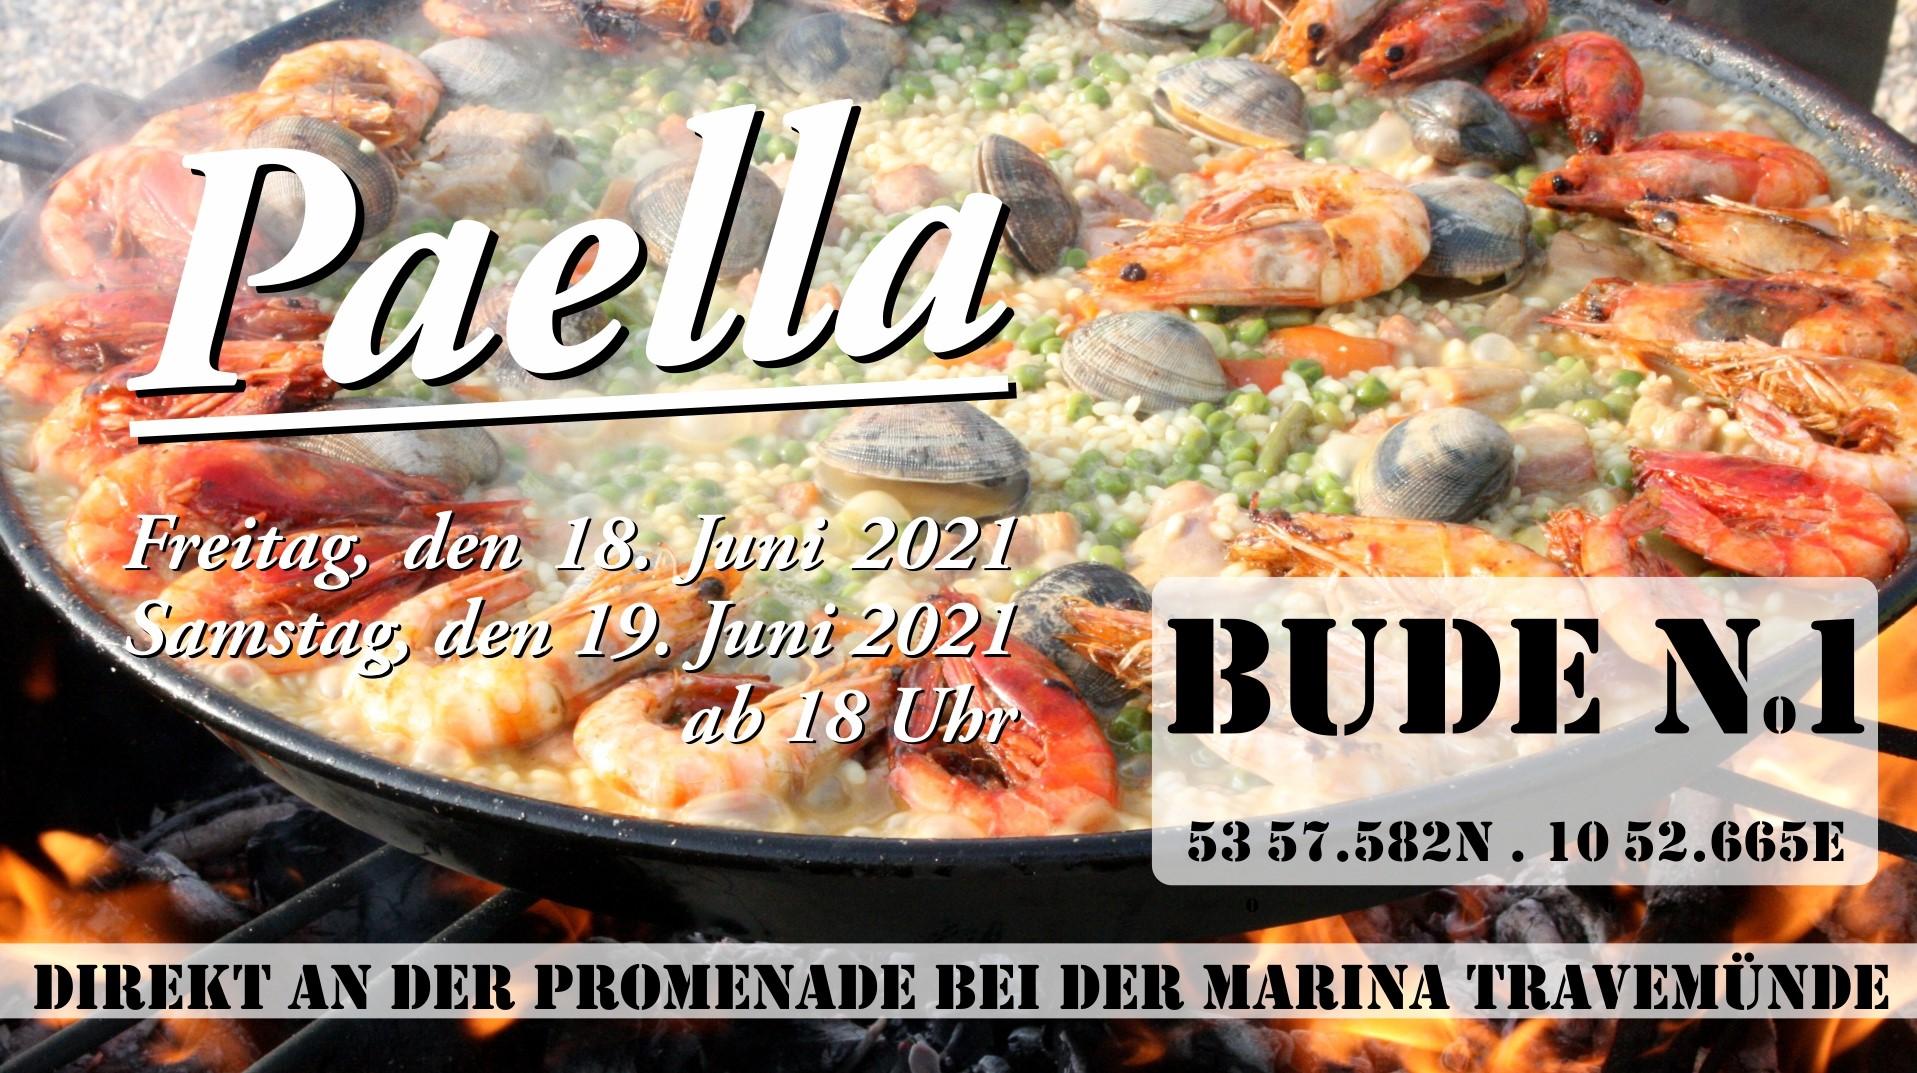 Paella an der Bude No 1